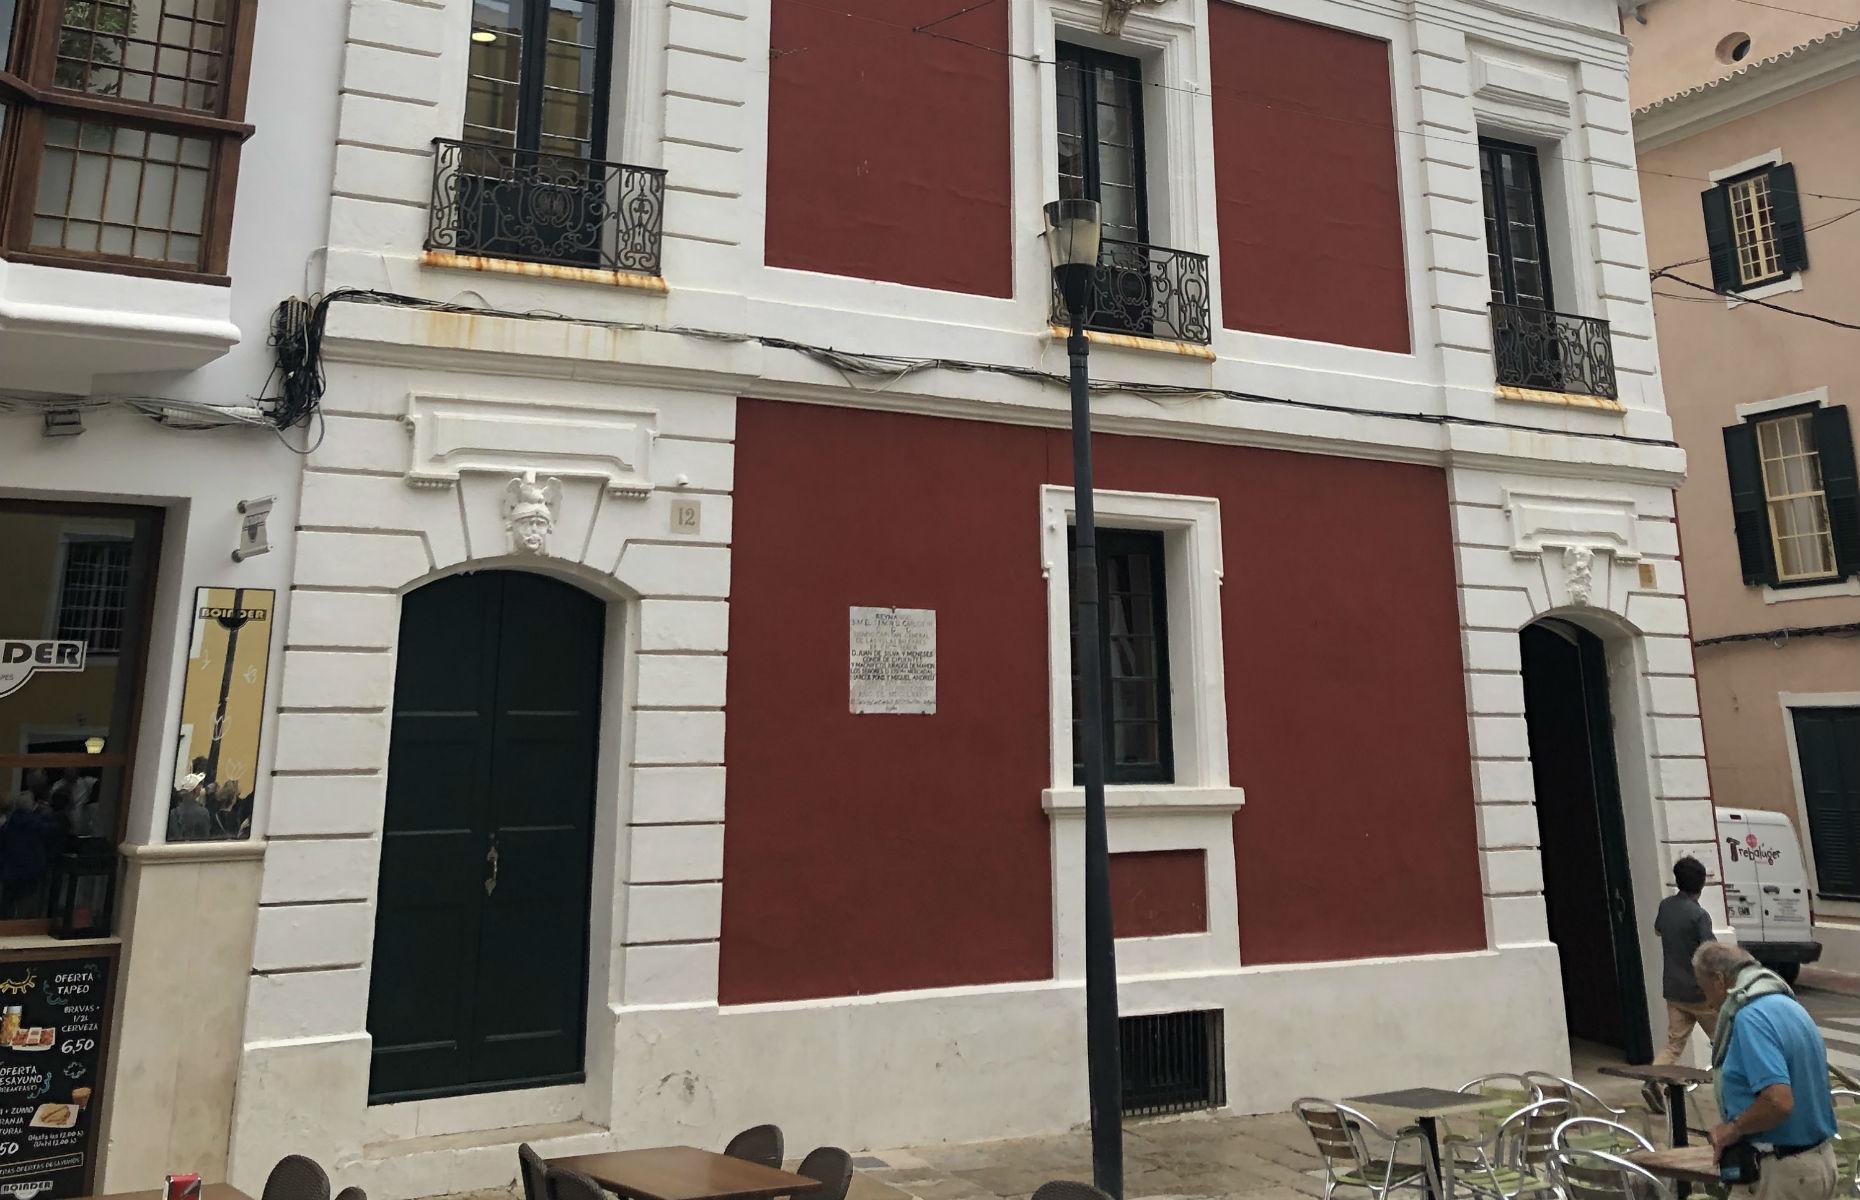 Mahon red brick building